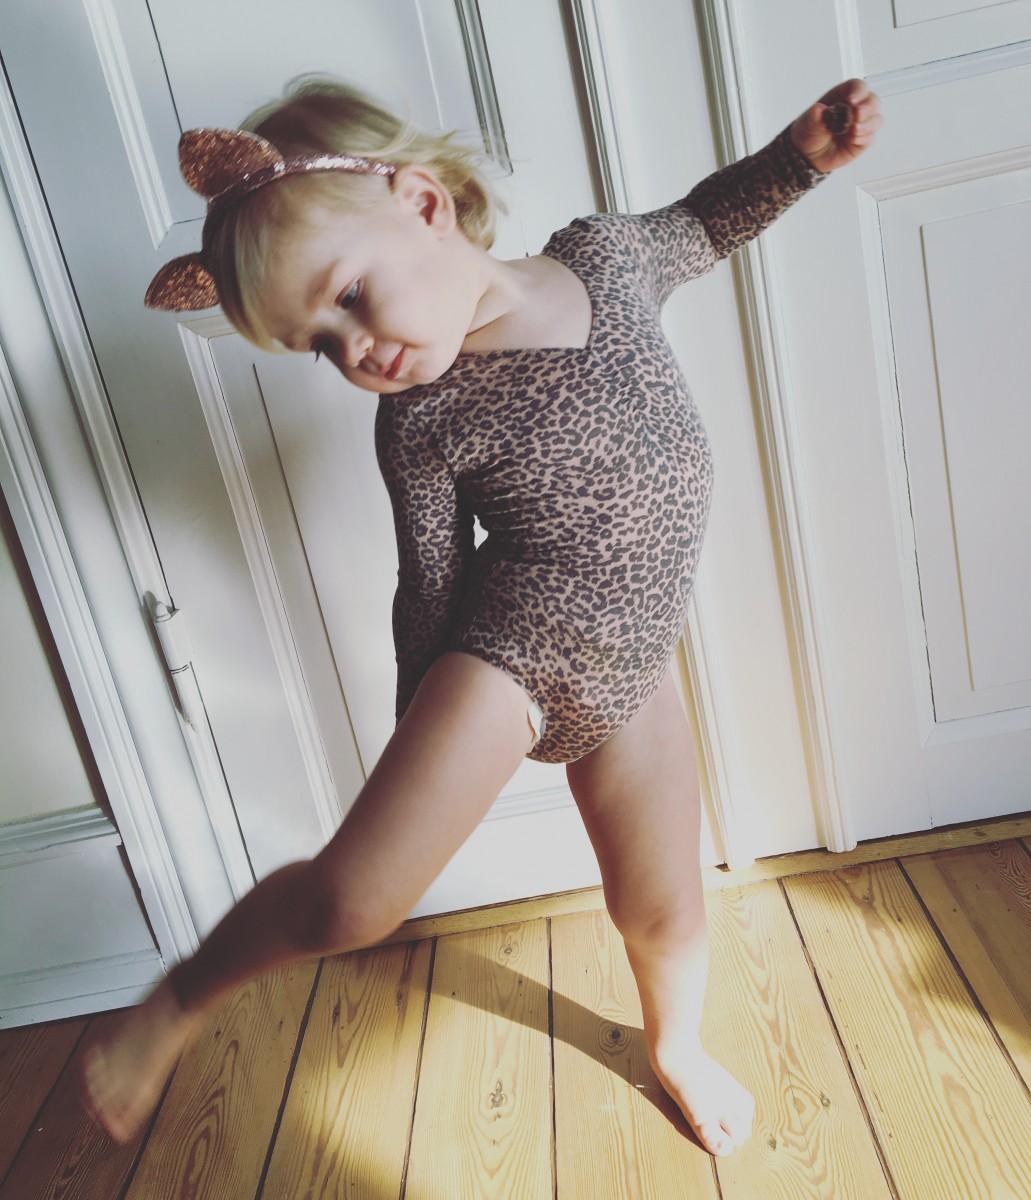 Vitaminpille helvede & små børn